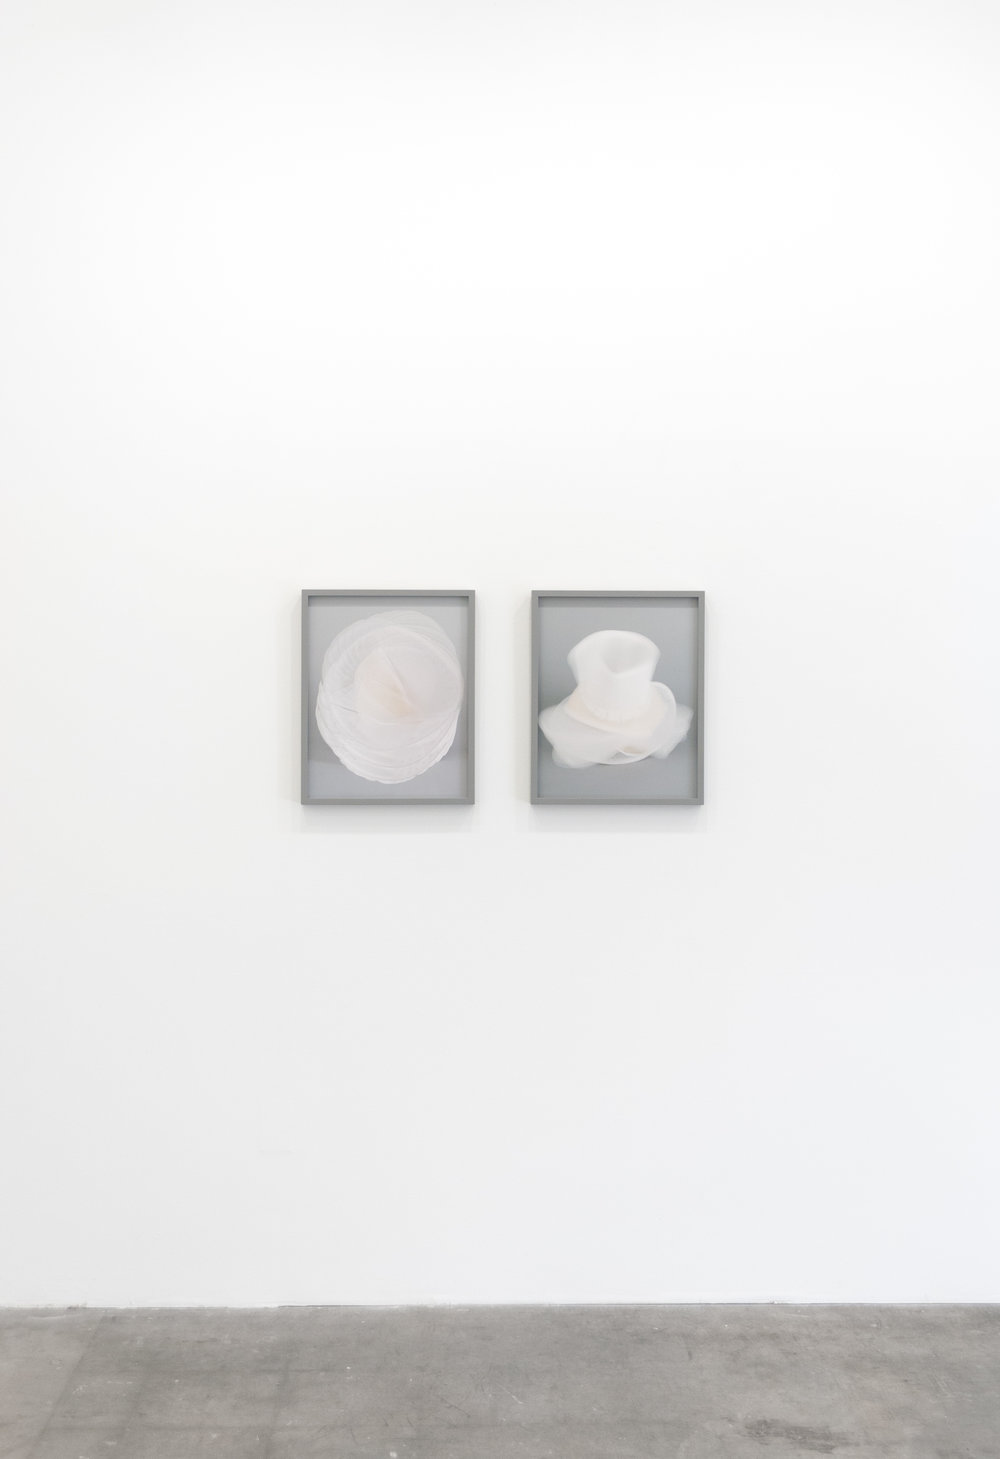 Melanie_Flood-Latent_Desire-Install-9.jpg